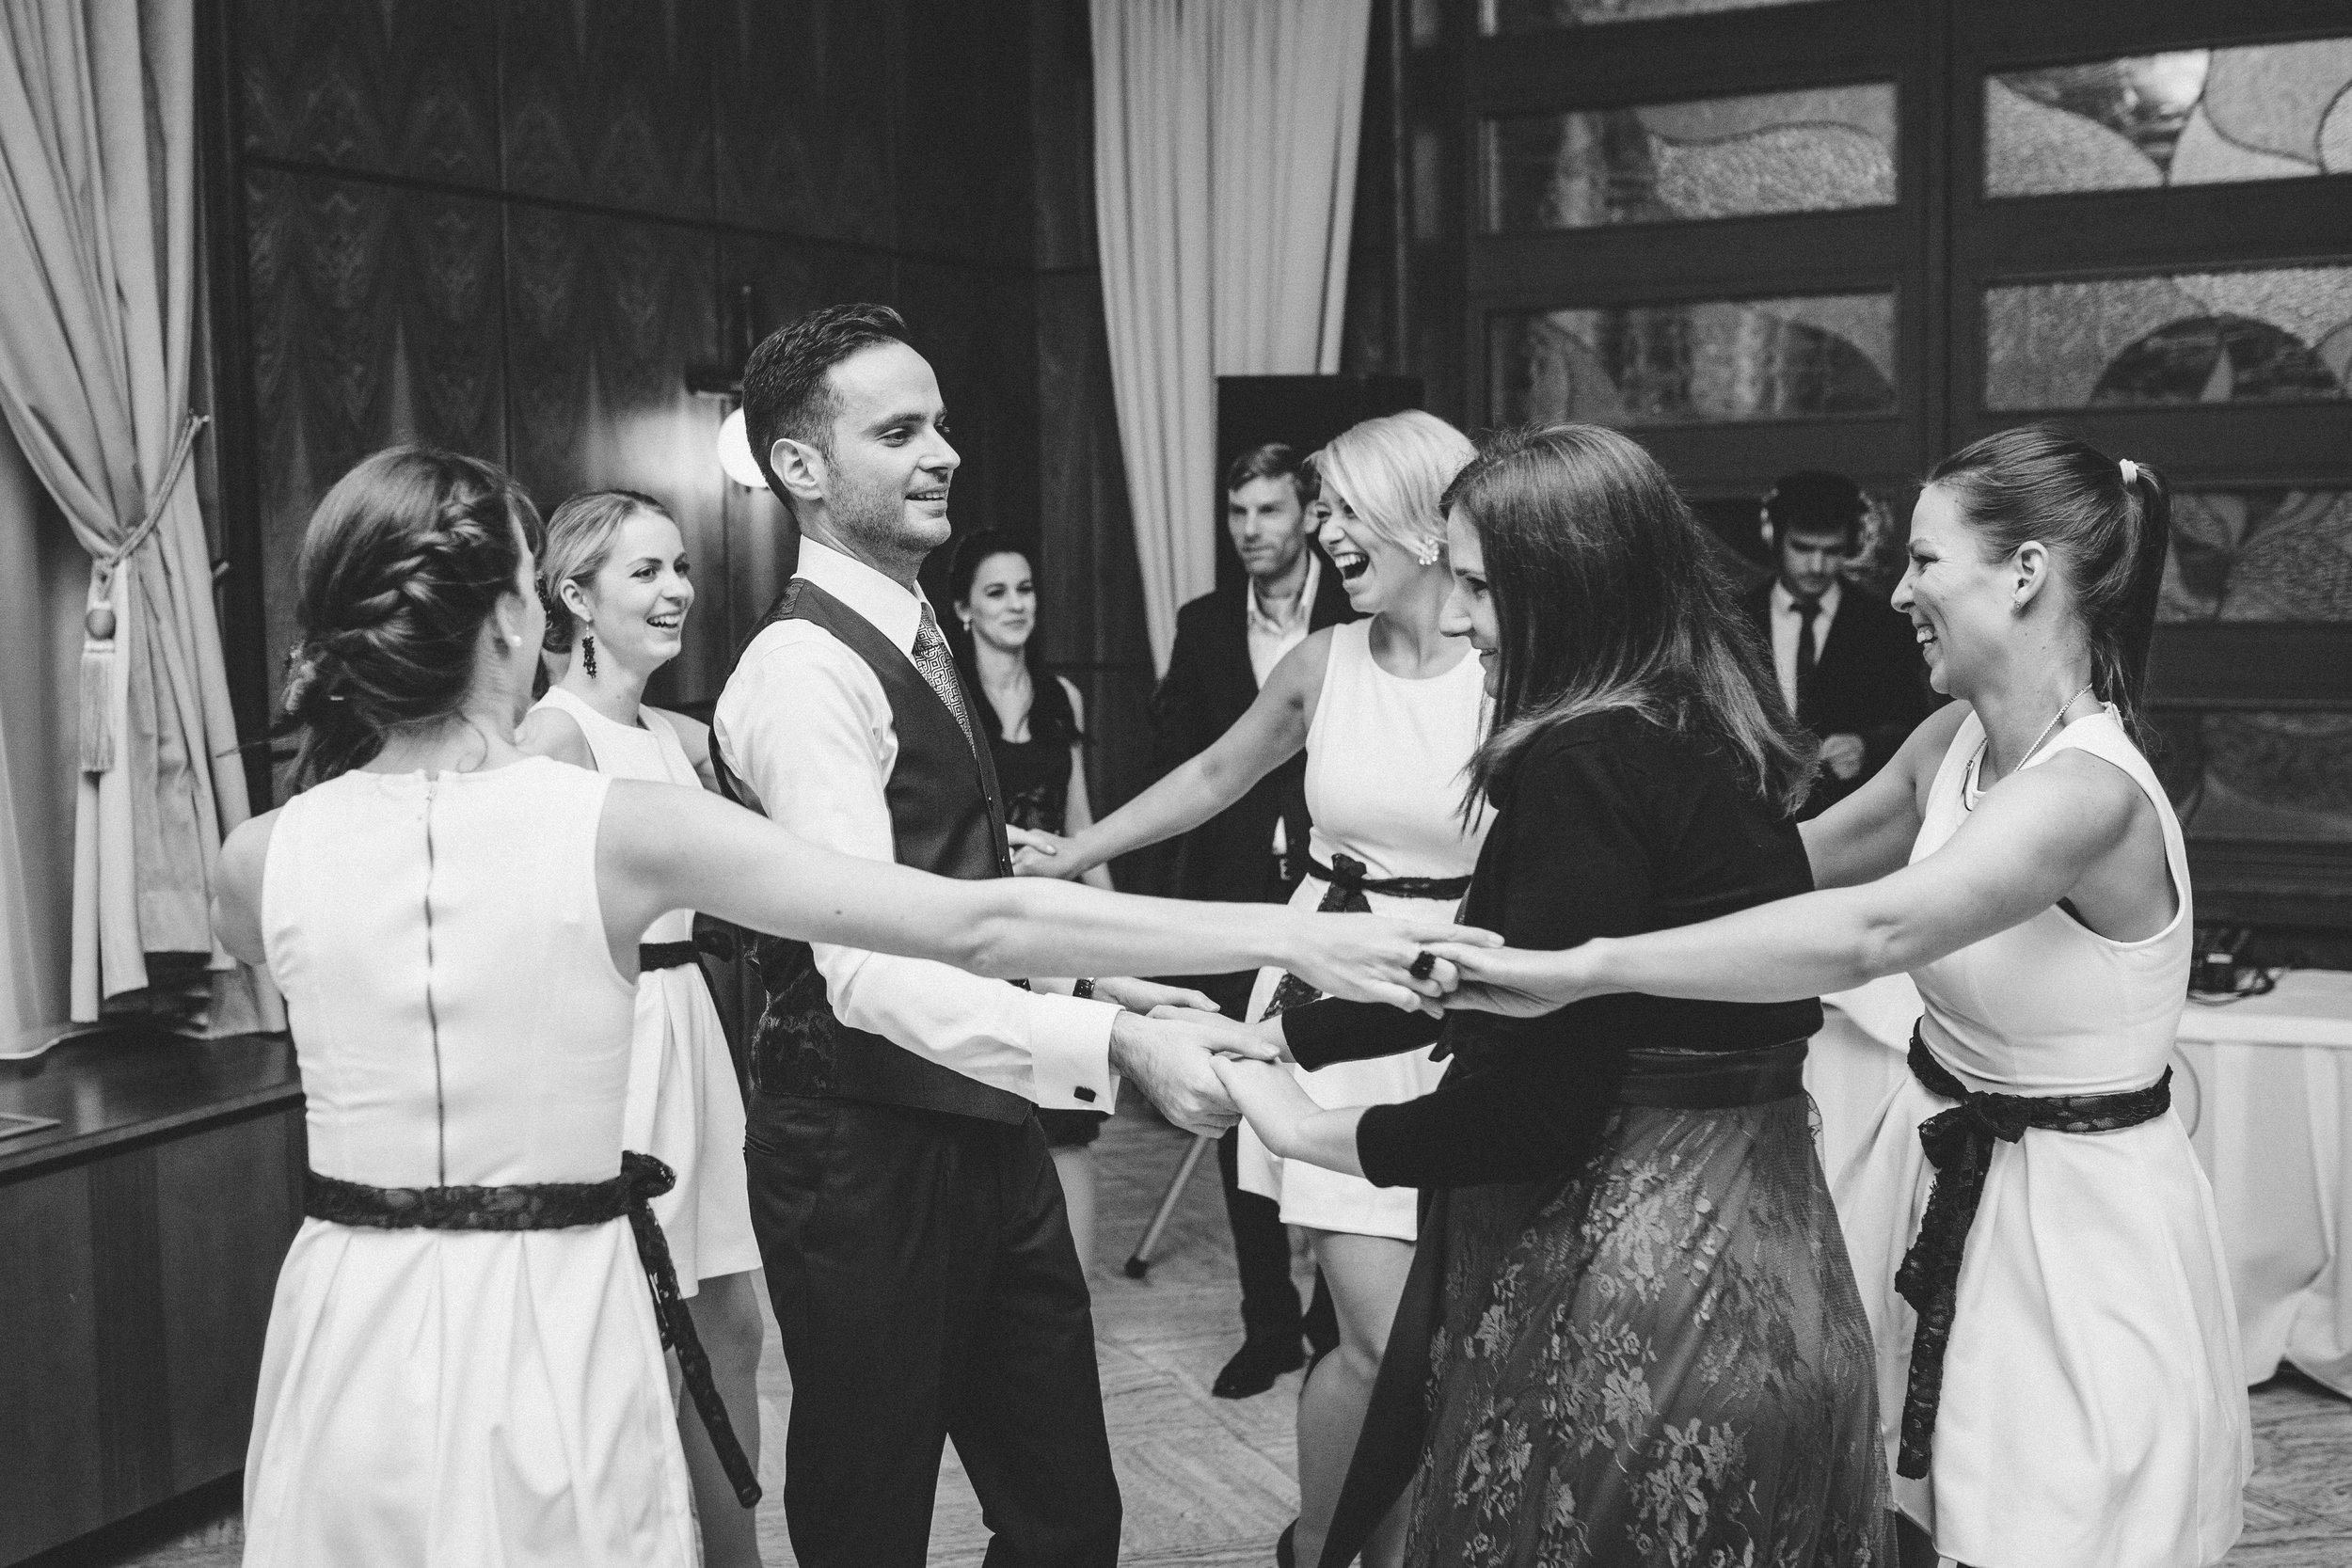 destination-wedding-photographer-slovakia-bratislava-bw-documentary-style-dancing-1.jpg